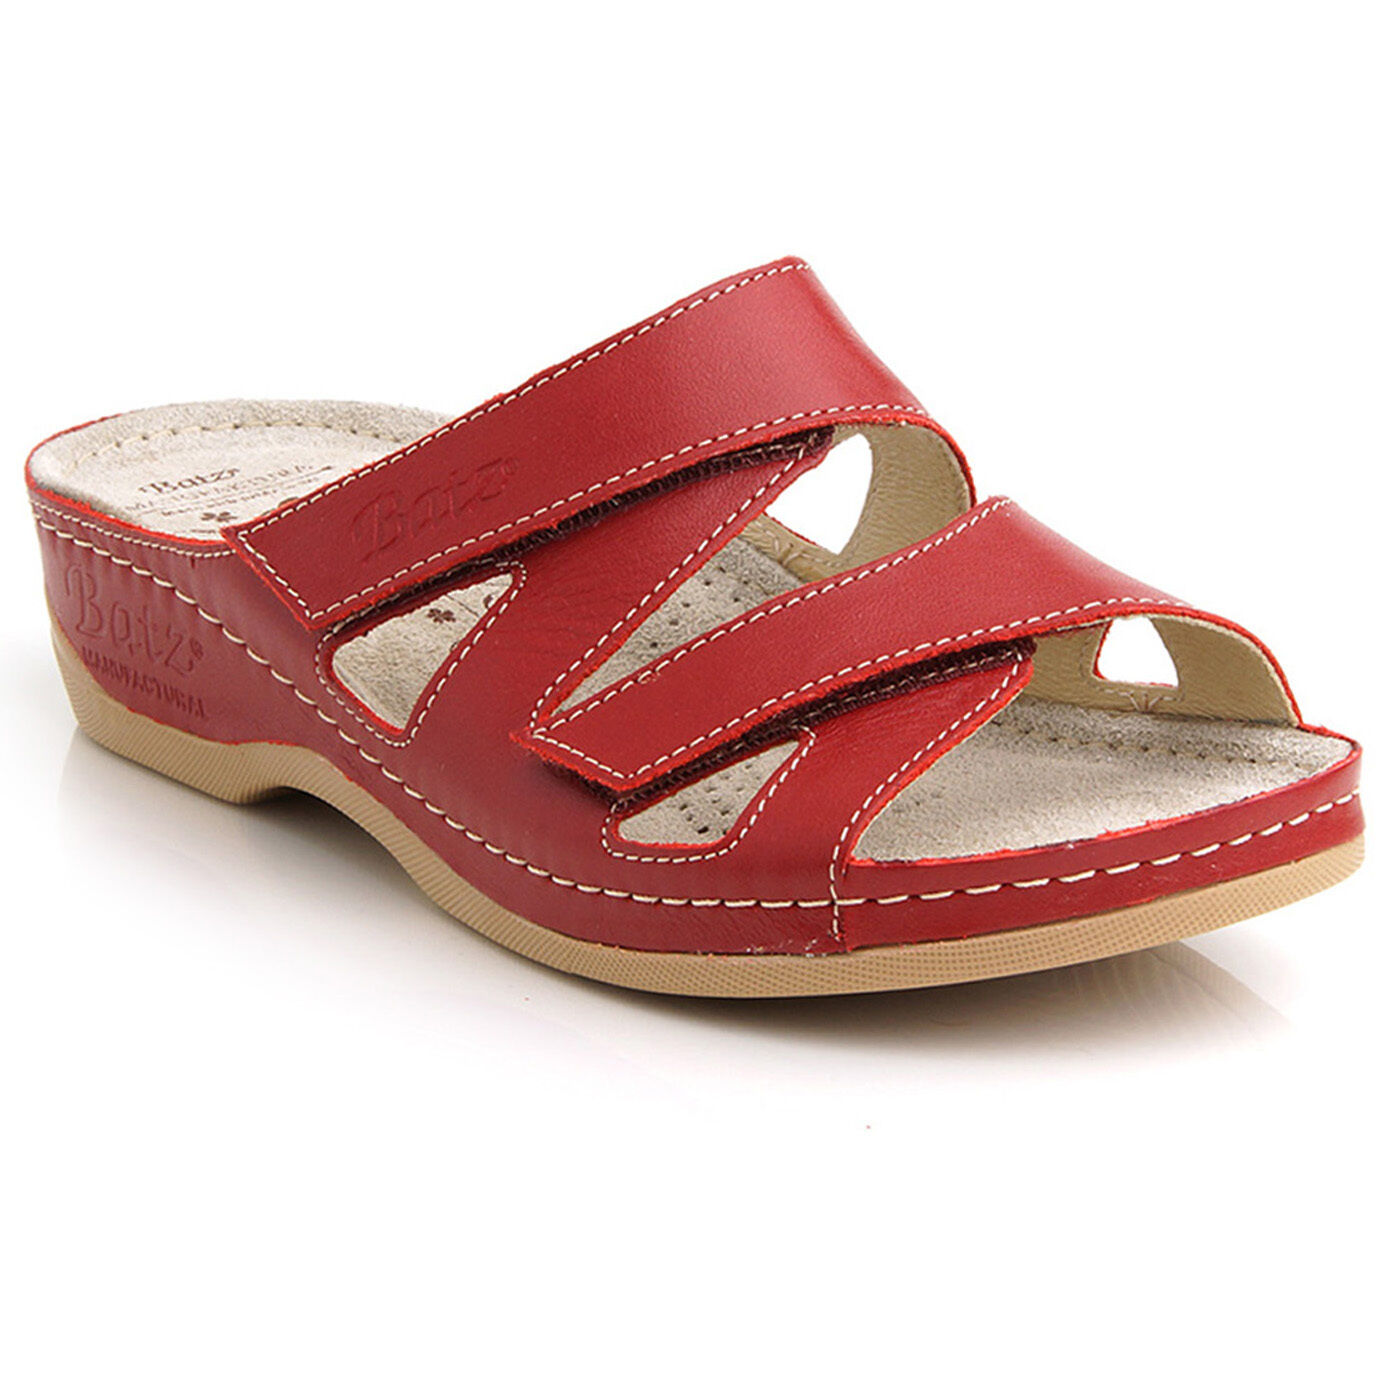 Batz ENI ROT Top Quality Handmade Leder Sandale Clogs Mules Damens EU 36-41